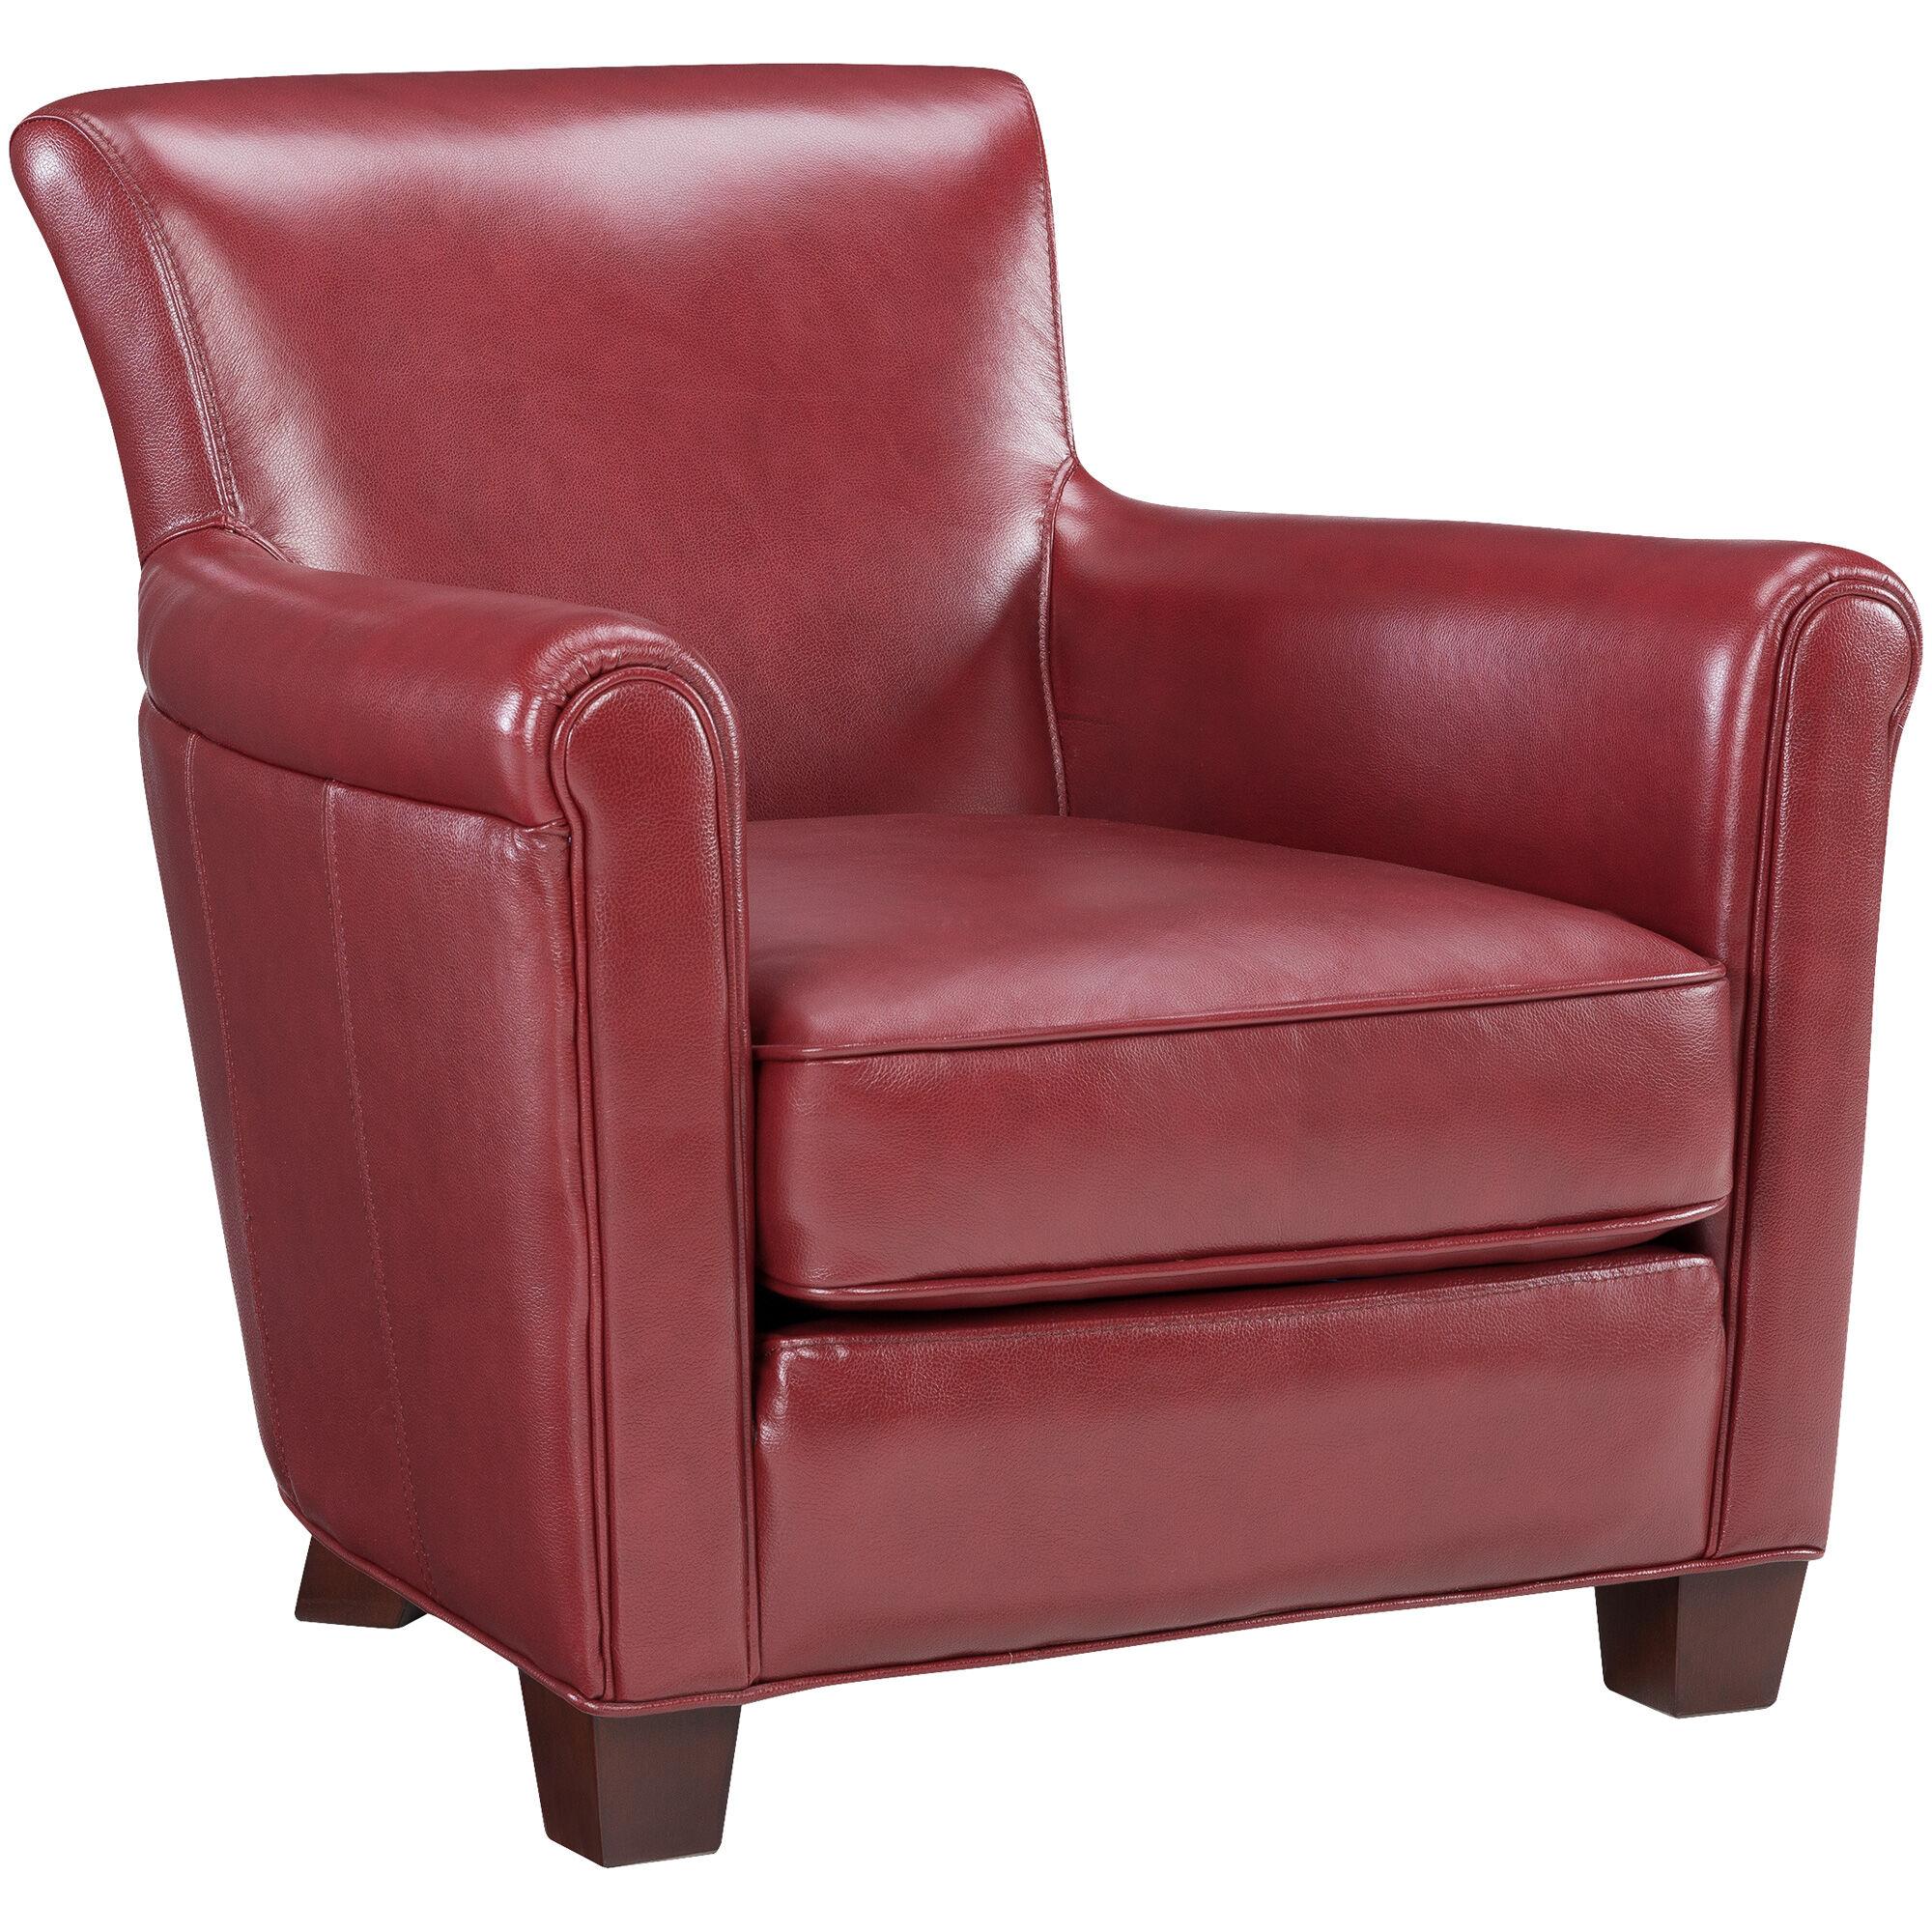 Winfield Chili Red Chair; Winfield Chili Red Chair ...